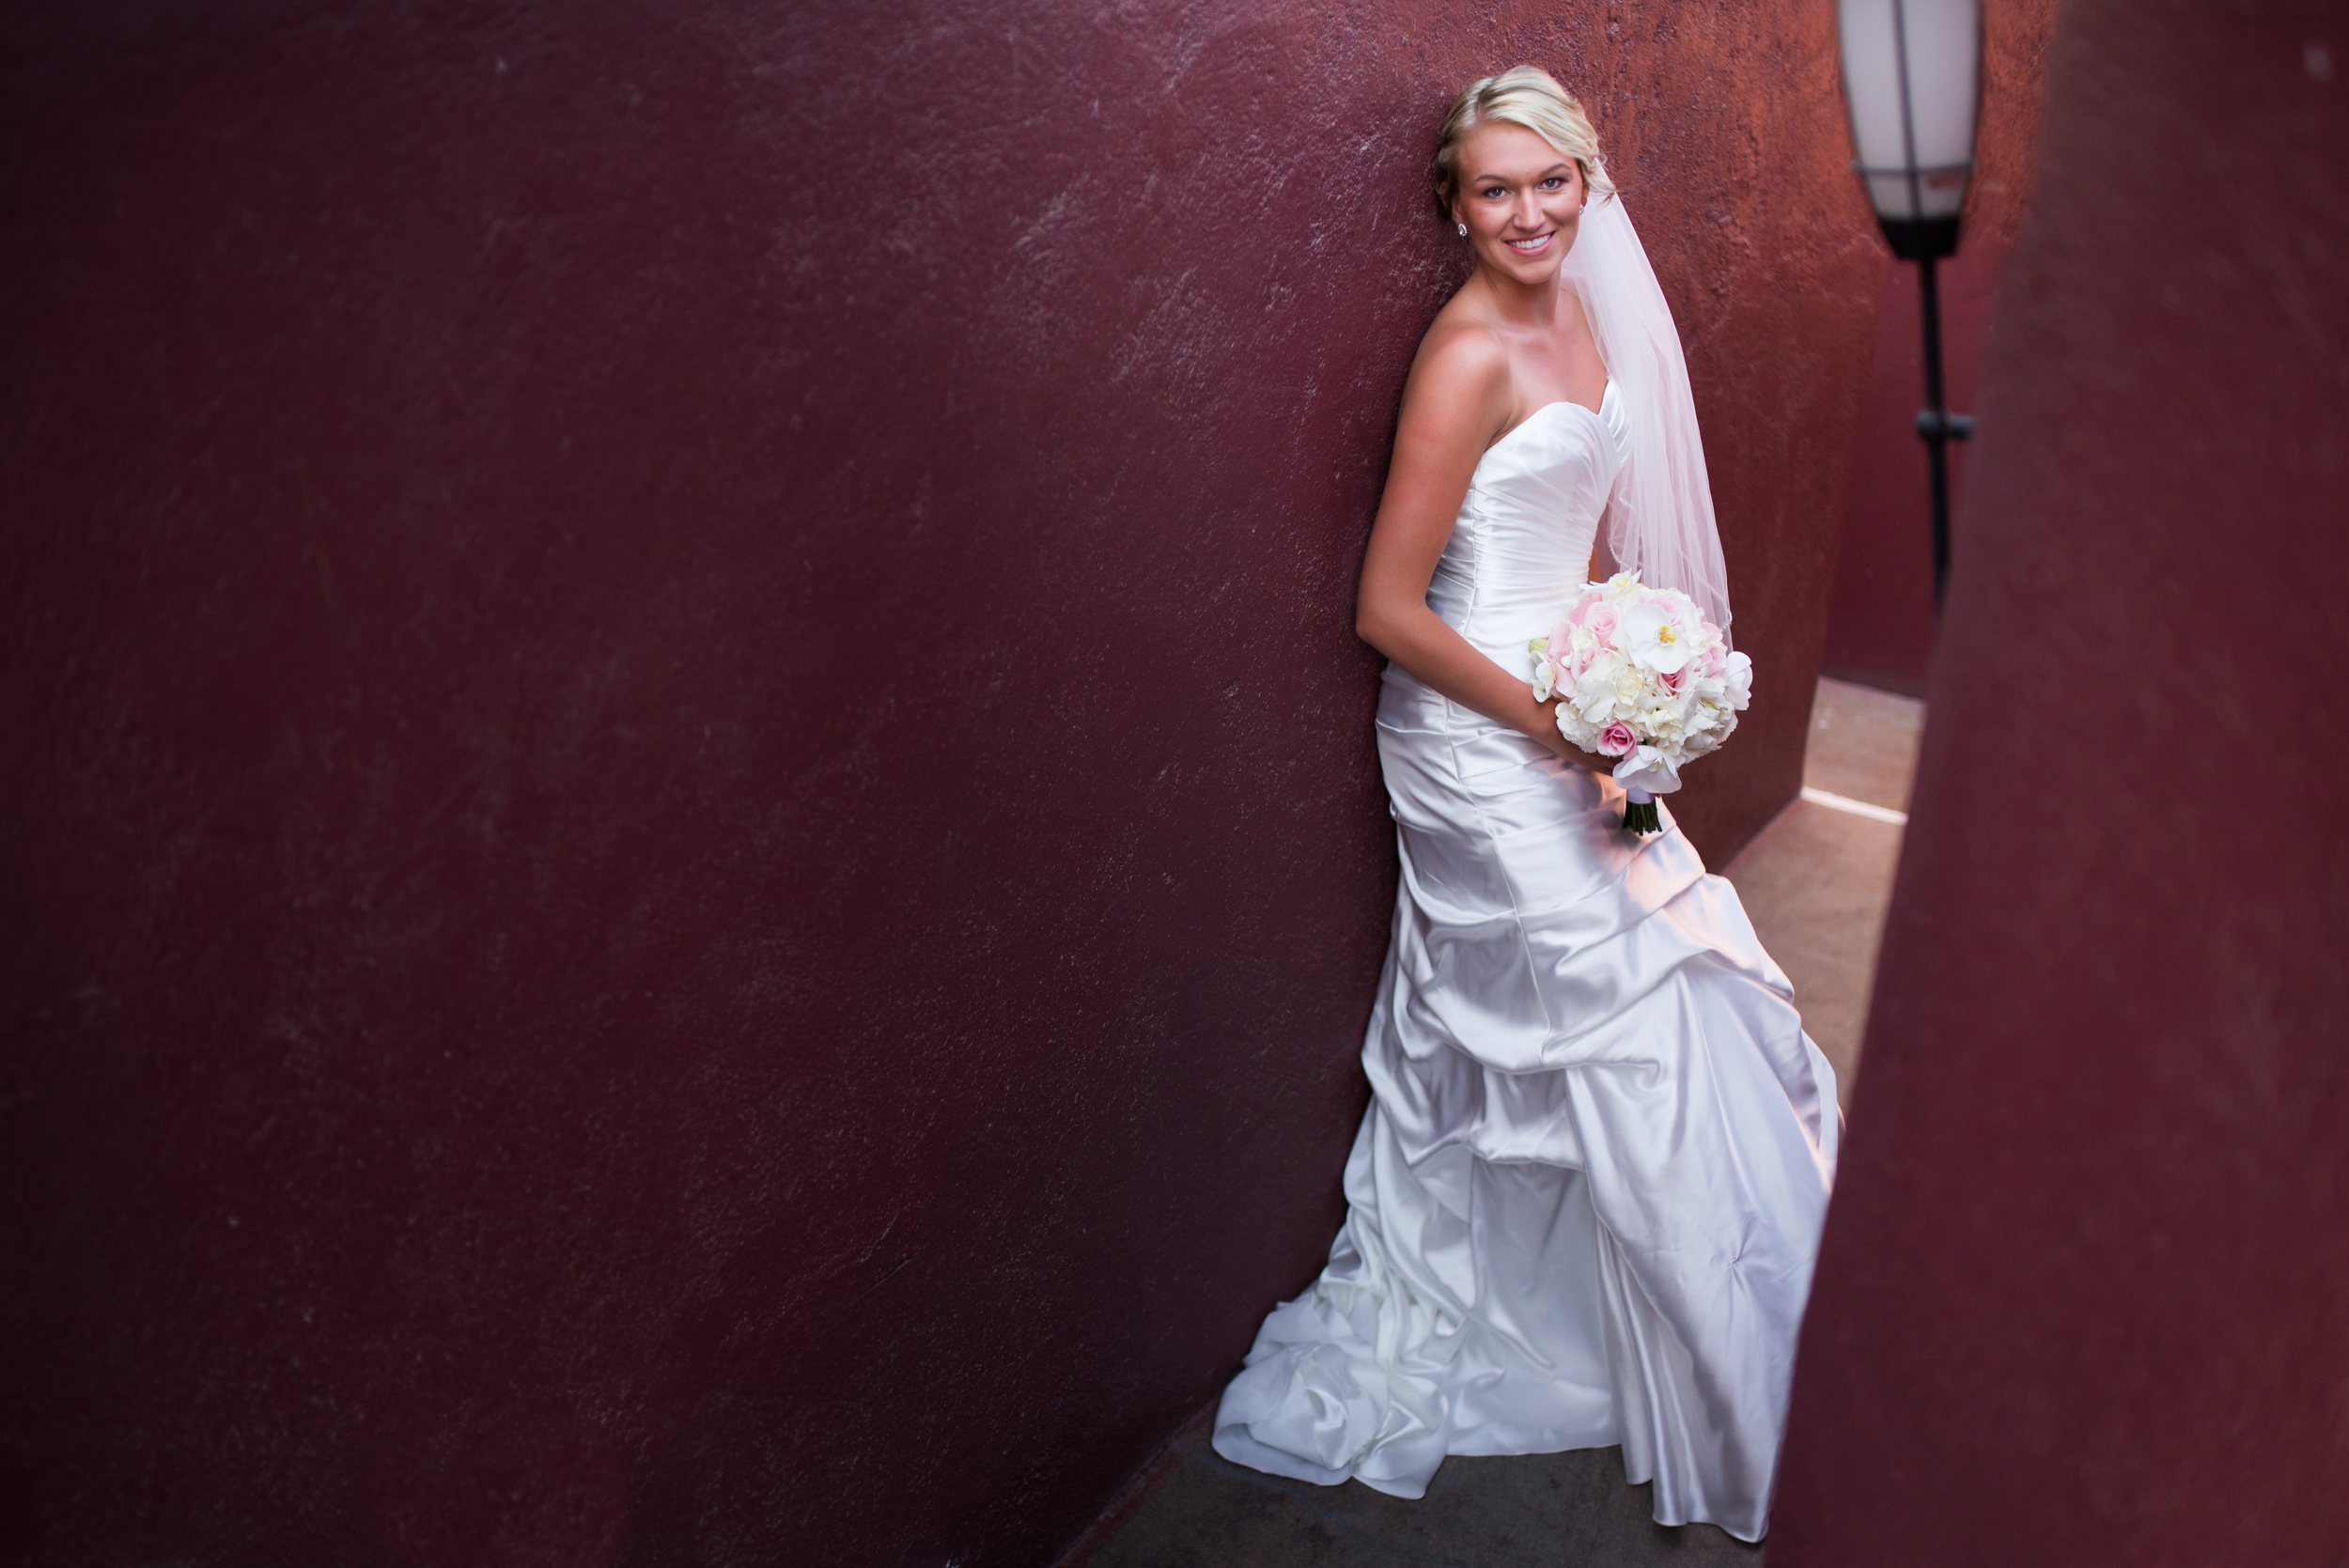 Our wedding day046.jpg